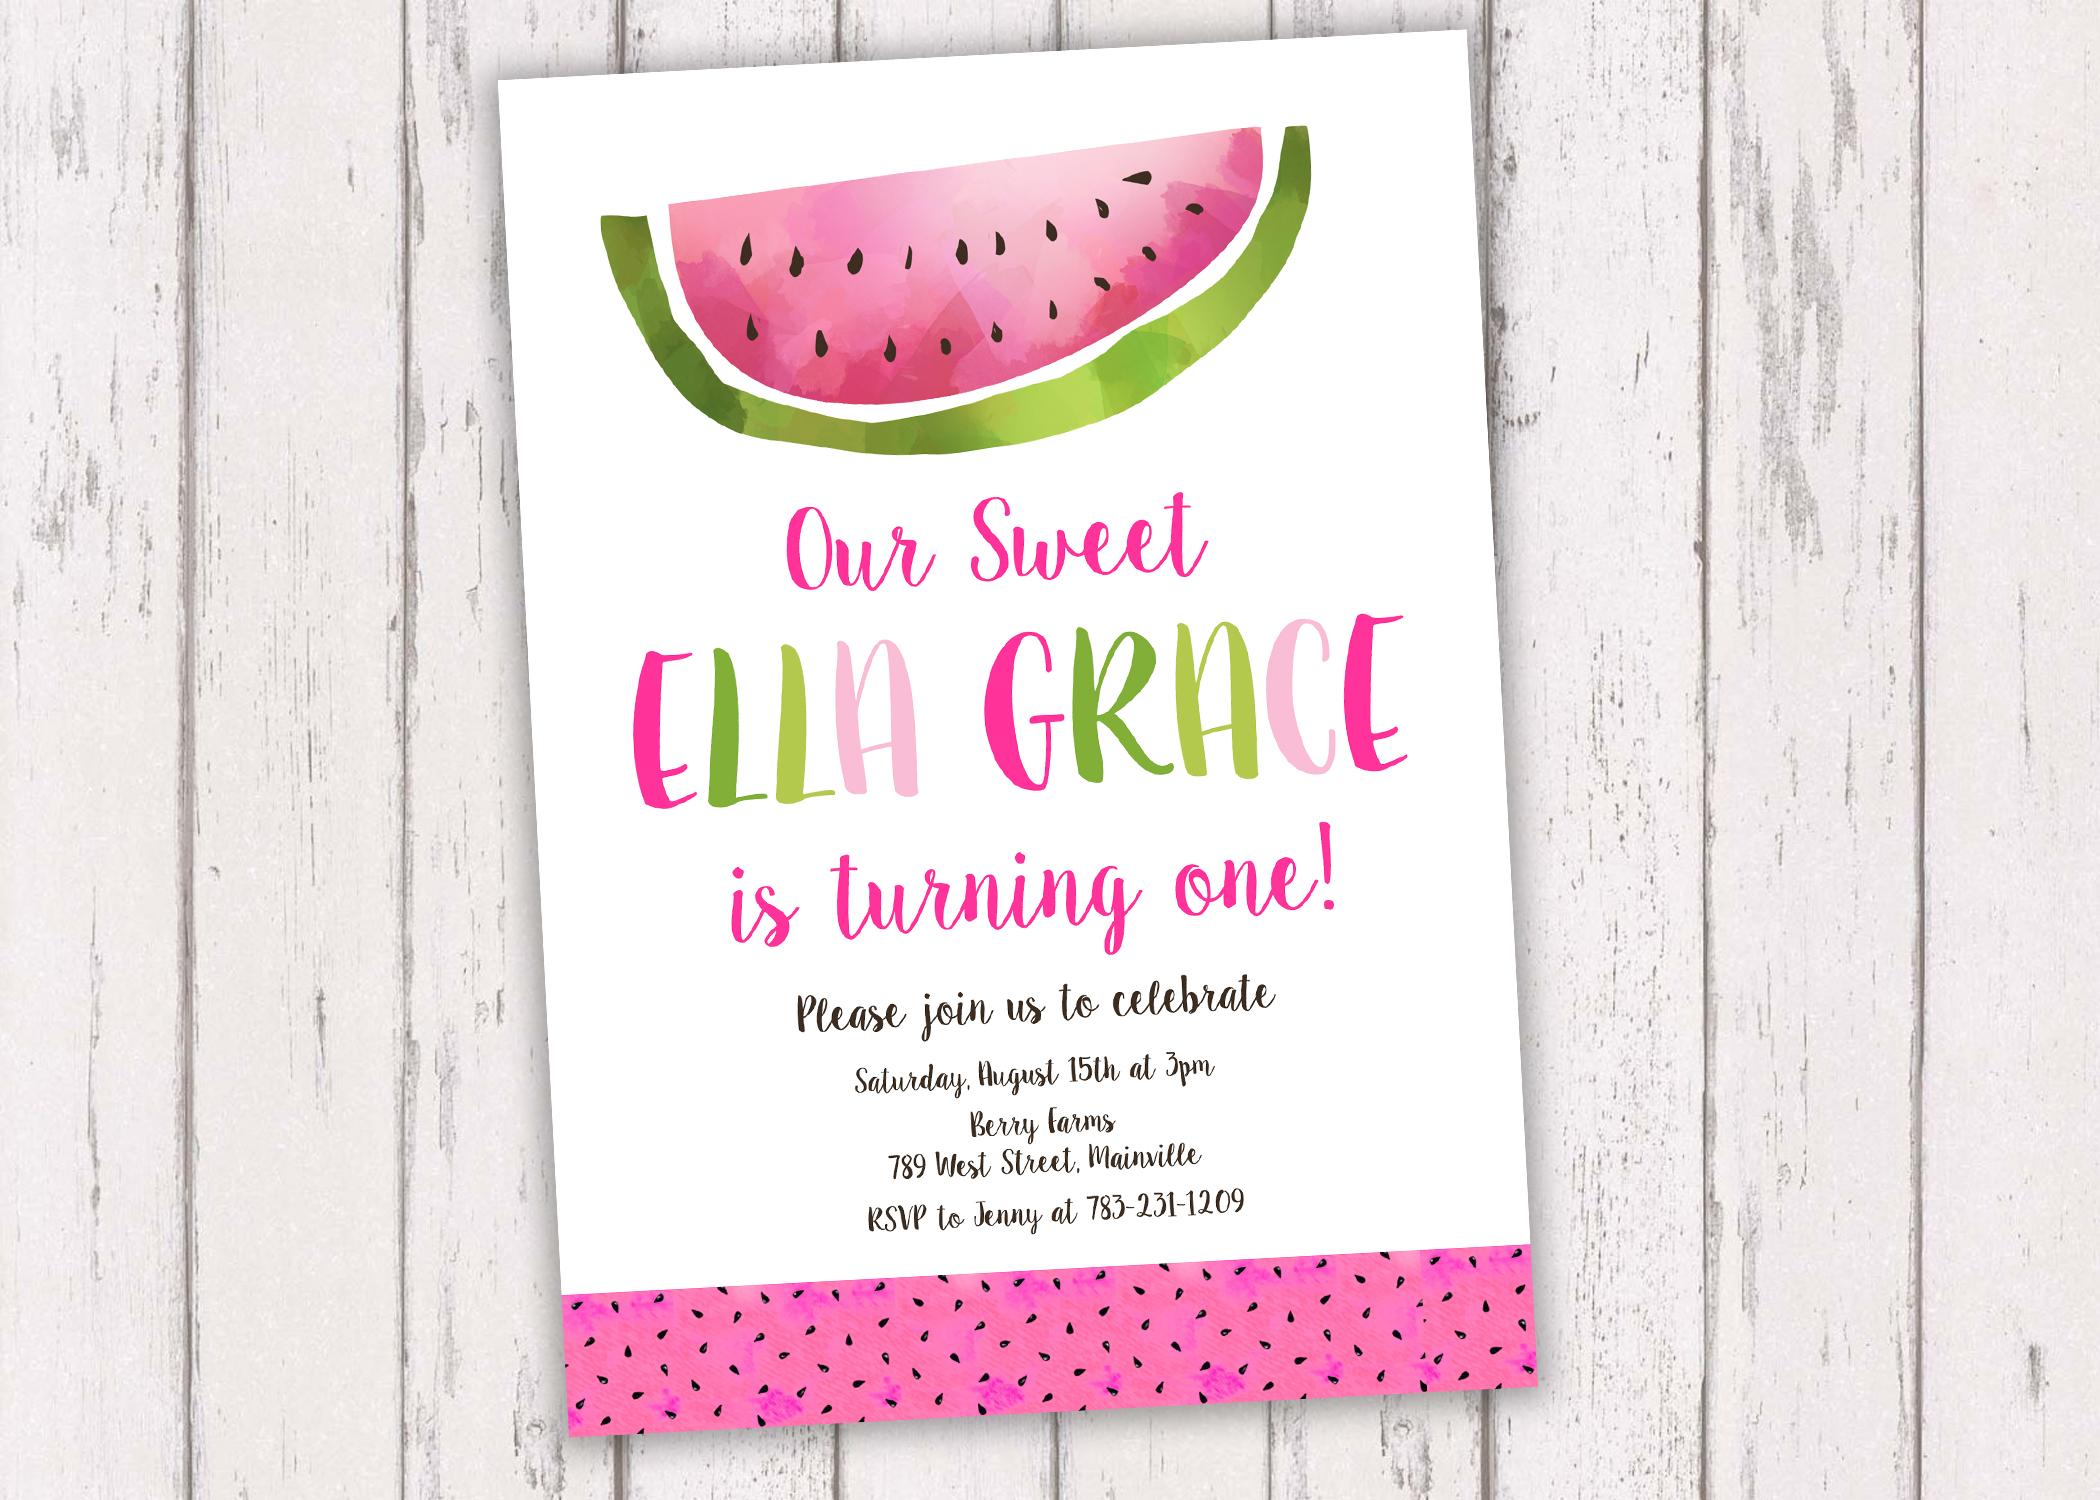 Watermelon Birthday Party Invitation, Watermelon, Melon, Fruit ...